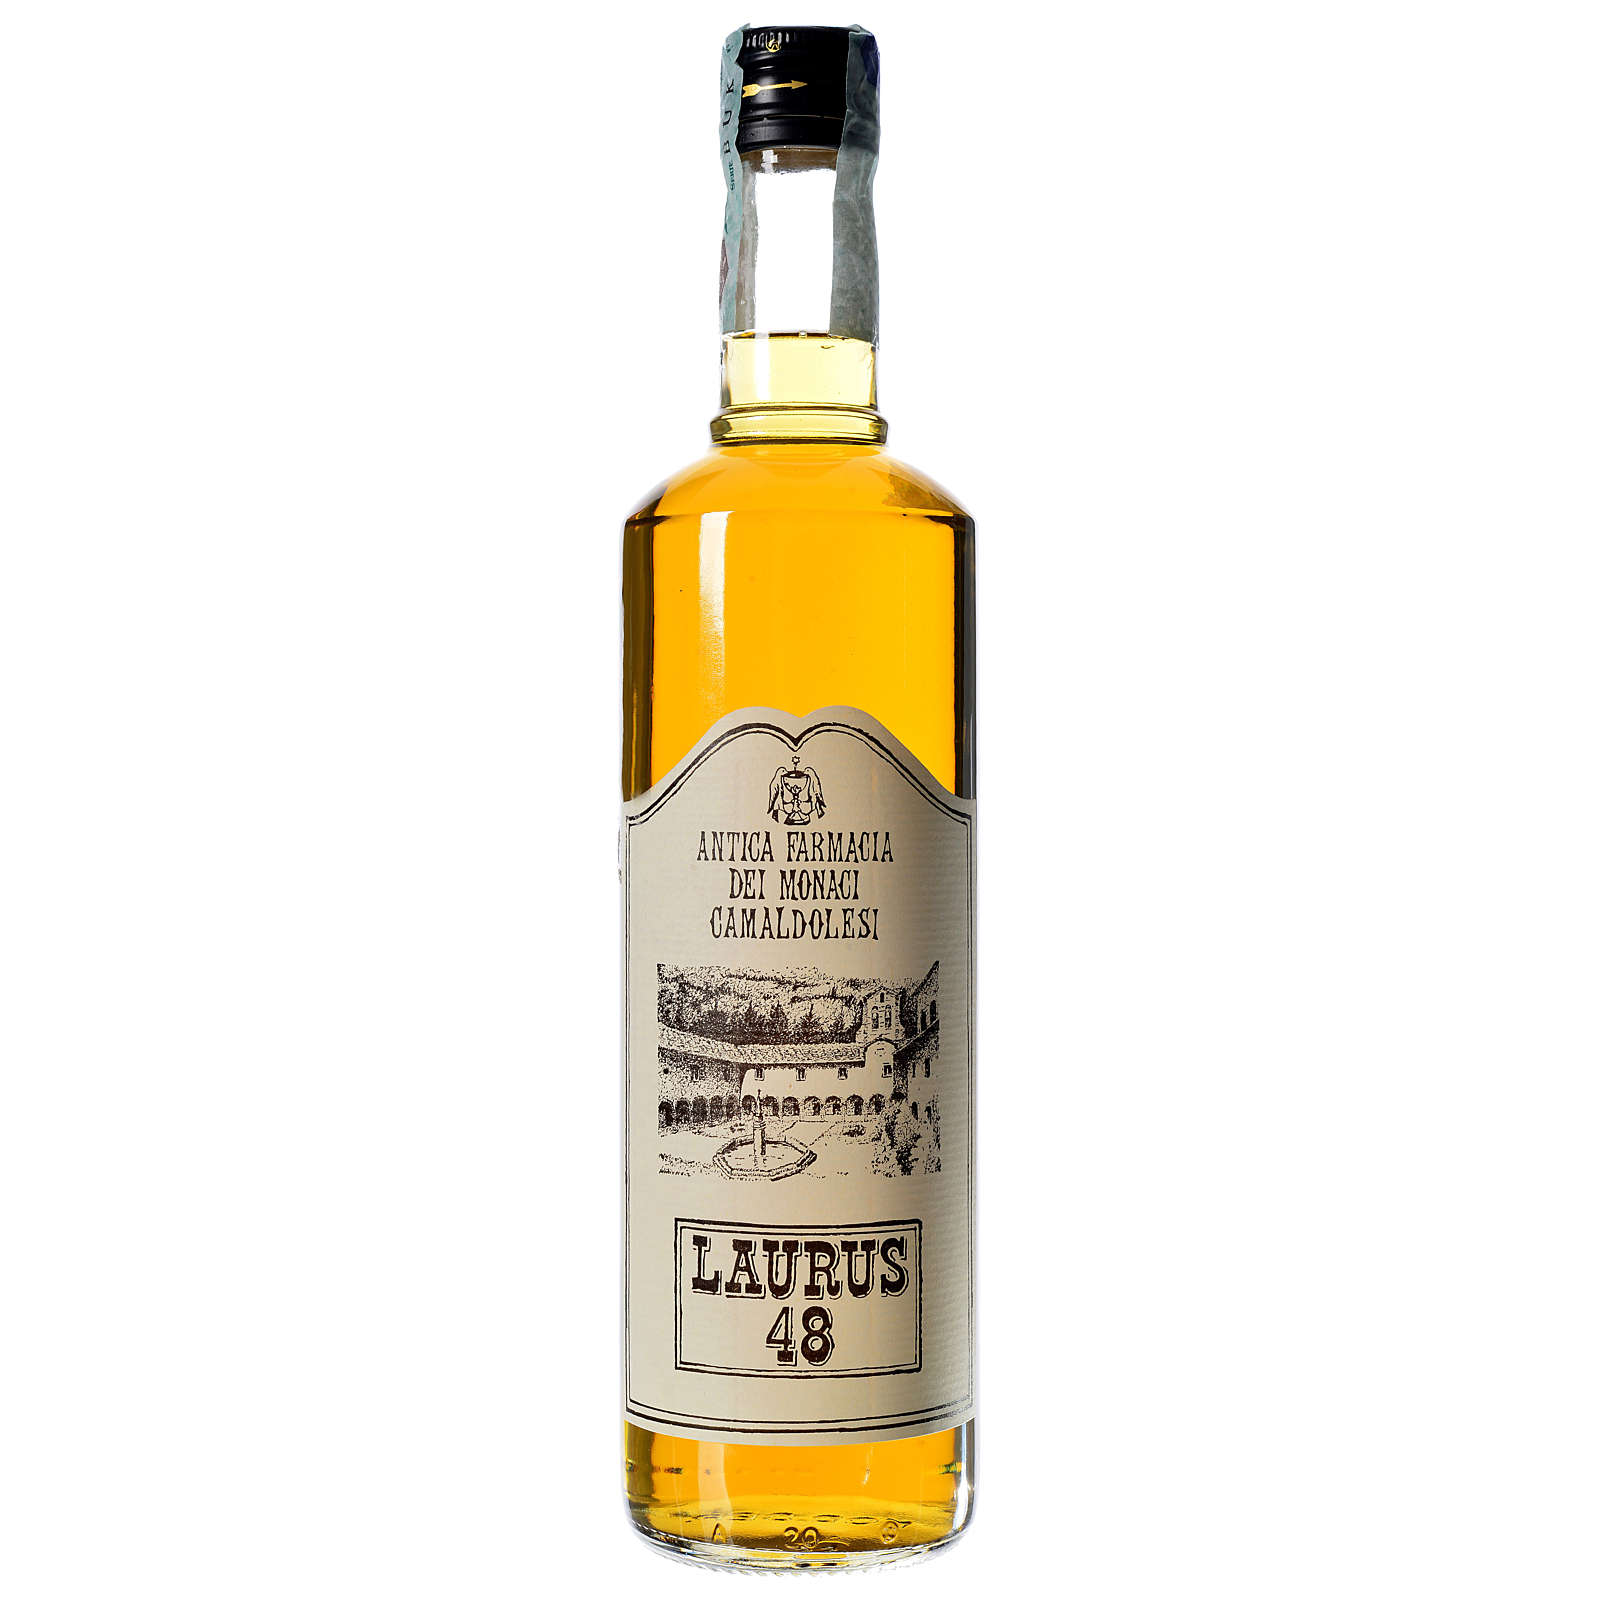 Laurus 48 de Camaldoli 700 ml 3